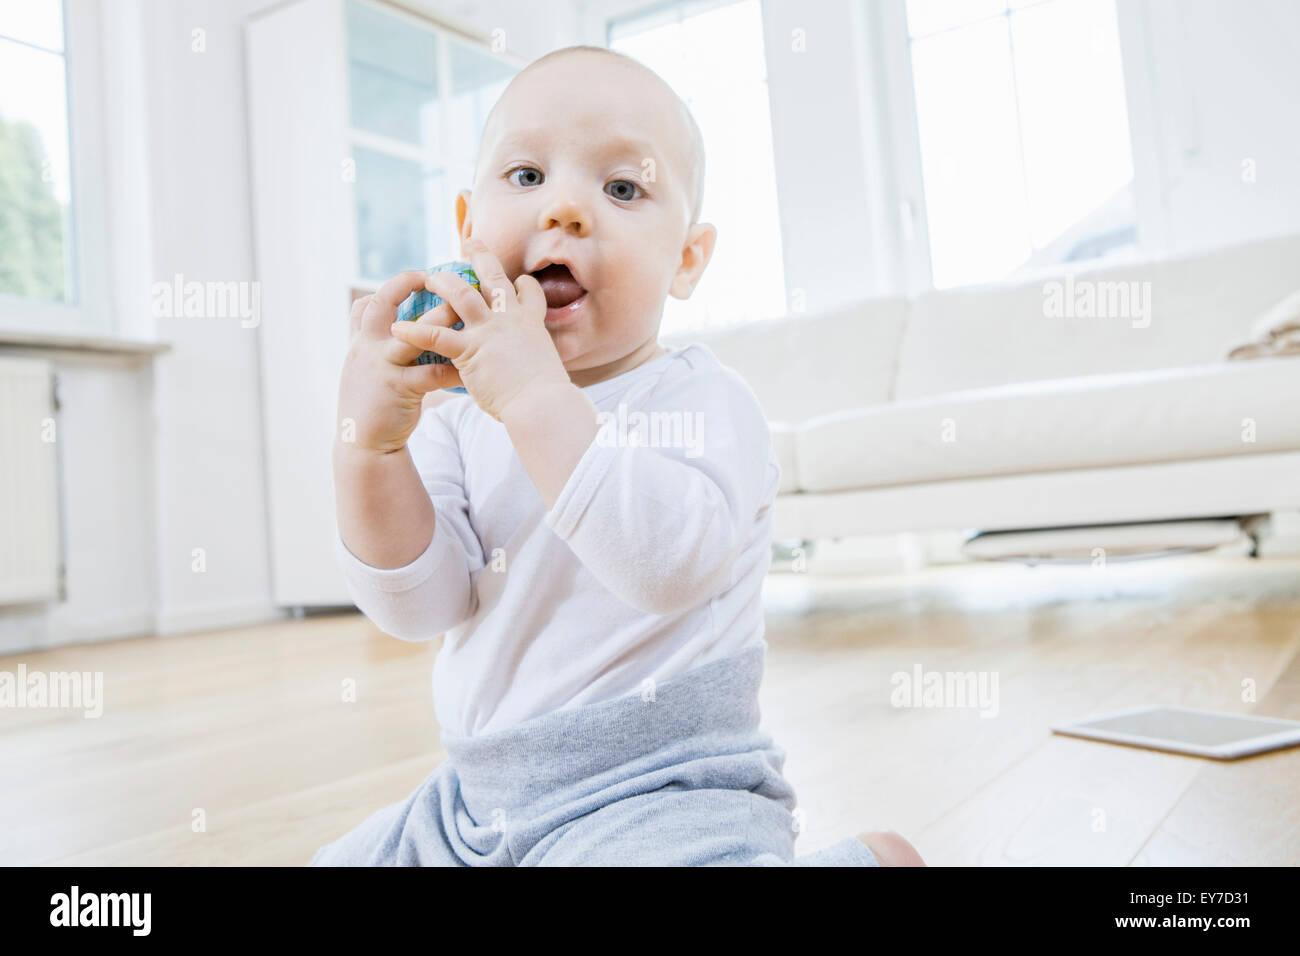 Portrait of baby boy - Stock Image